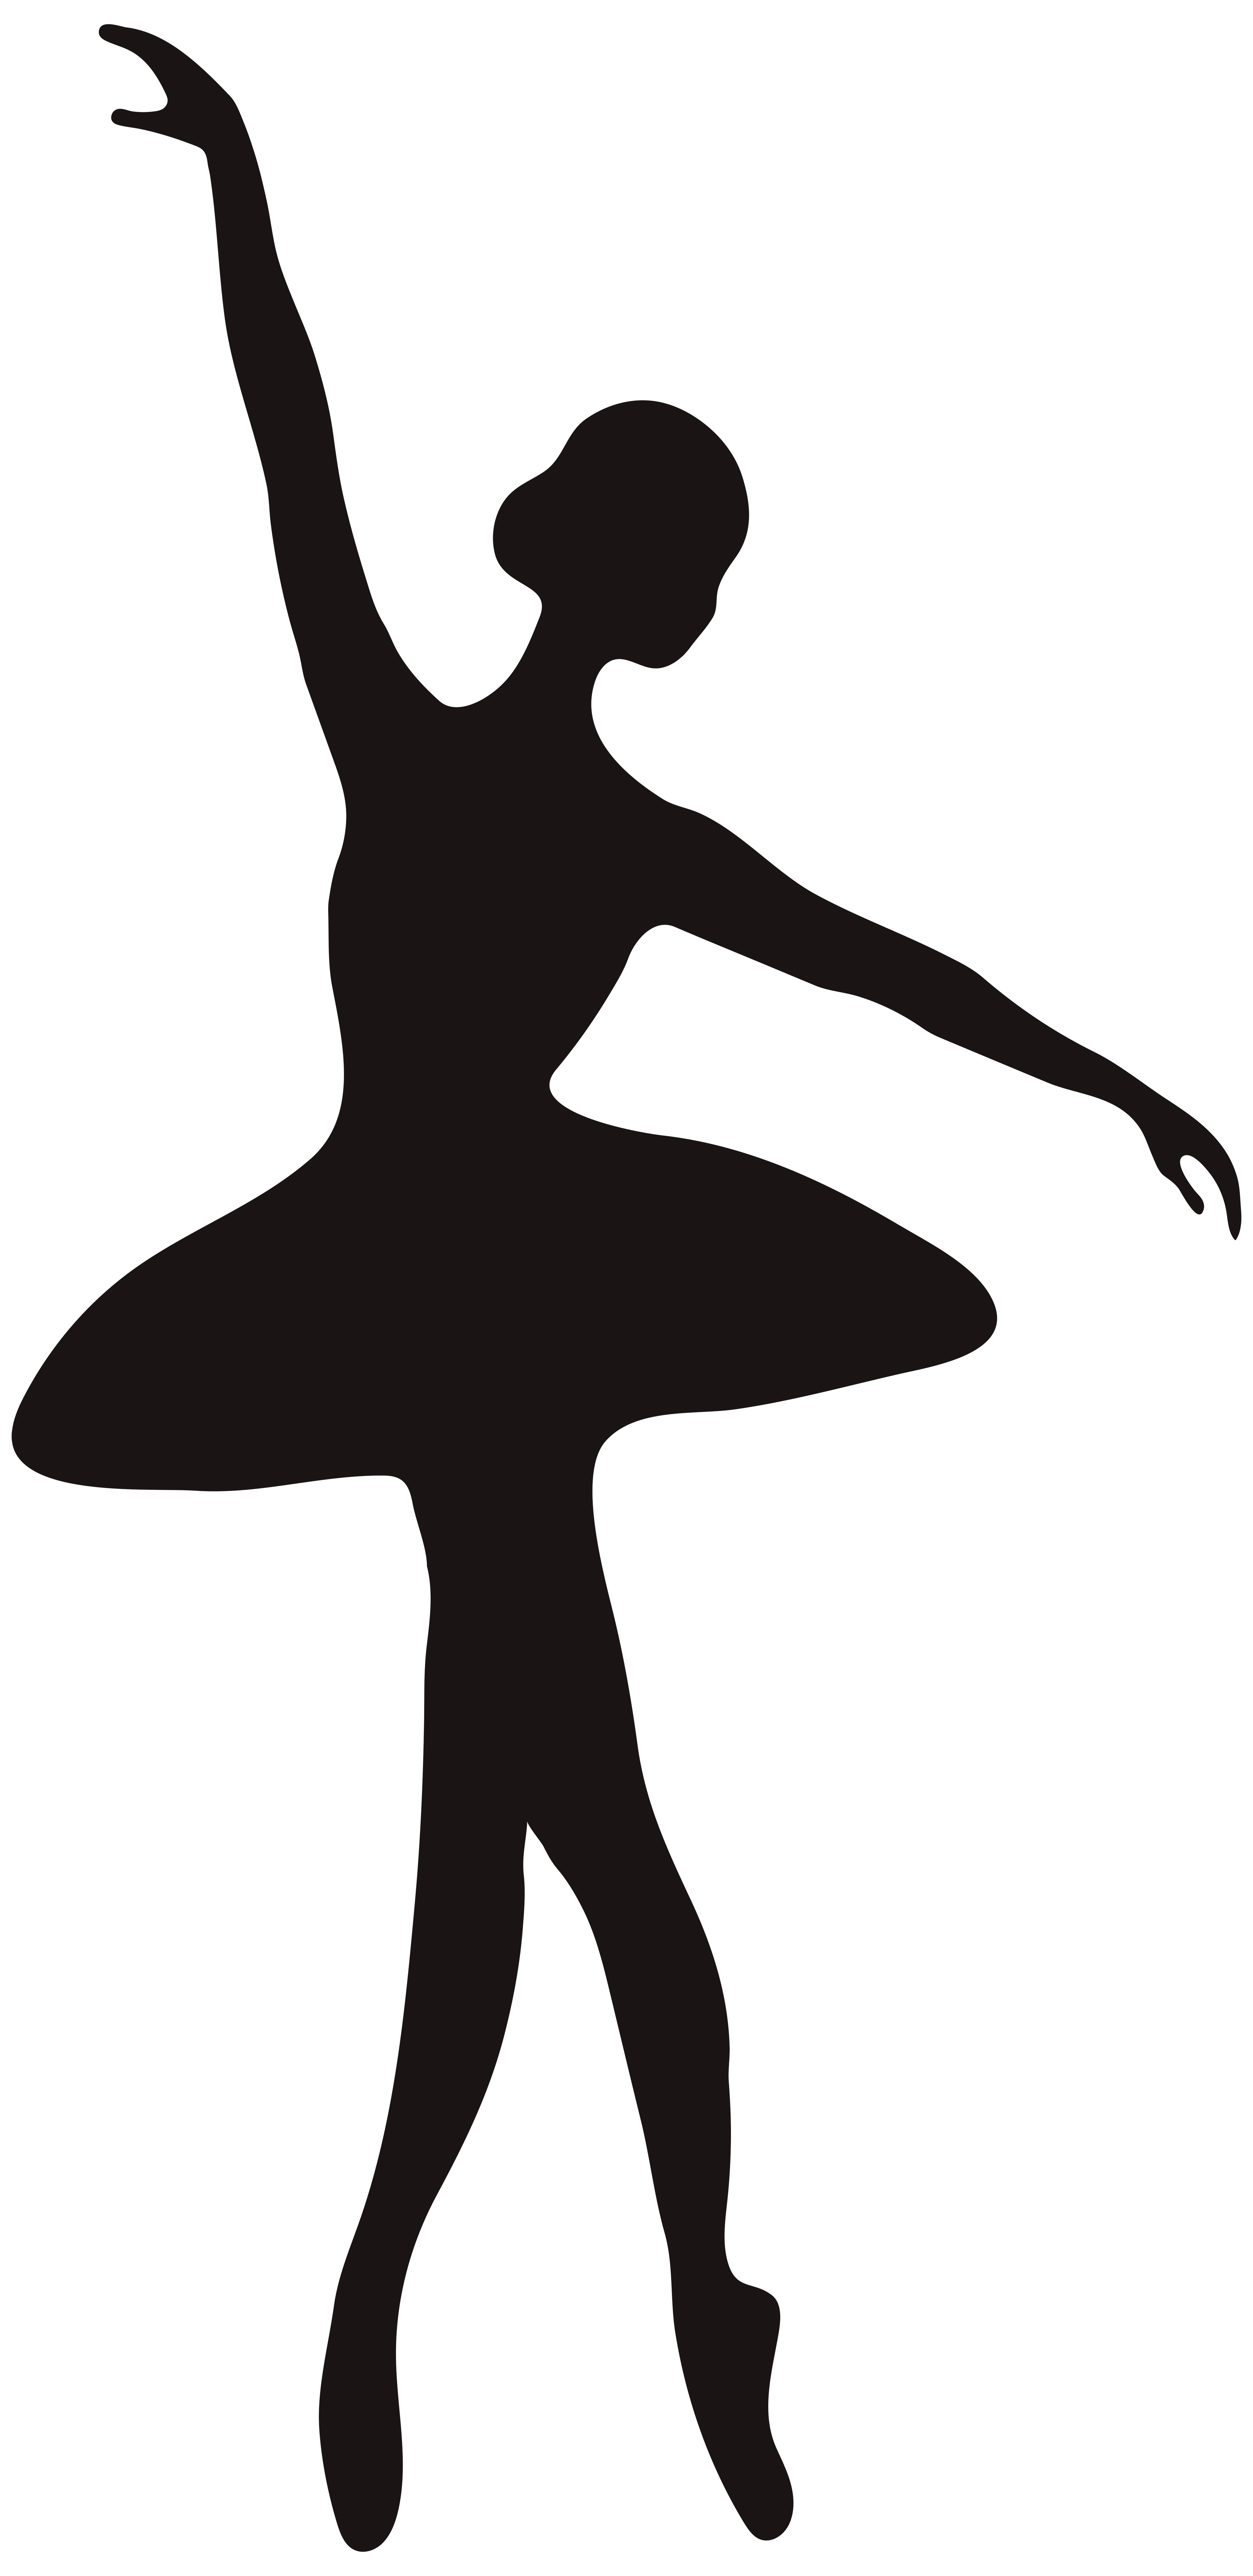 3890x8000 Silhouette Ballerina Clipart, Explore Pictures